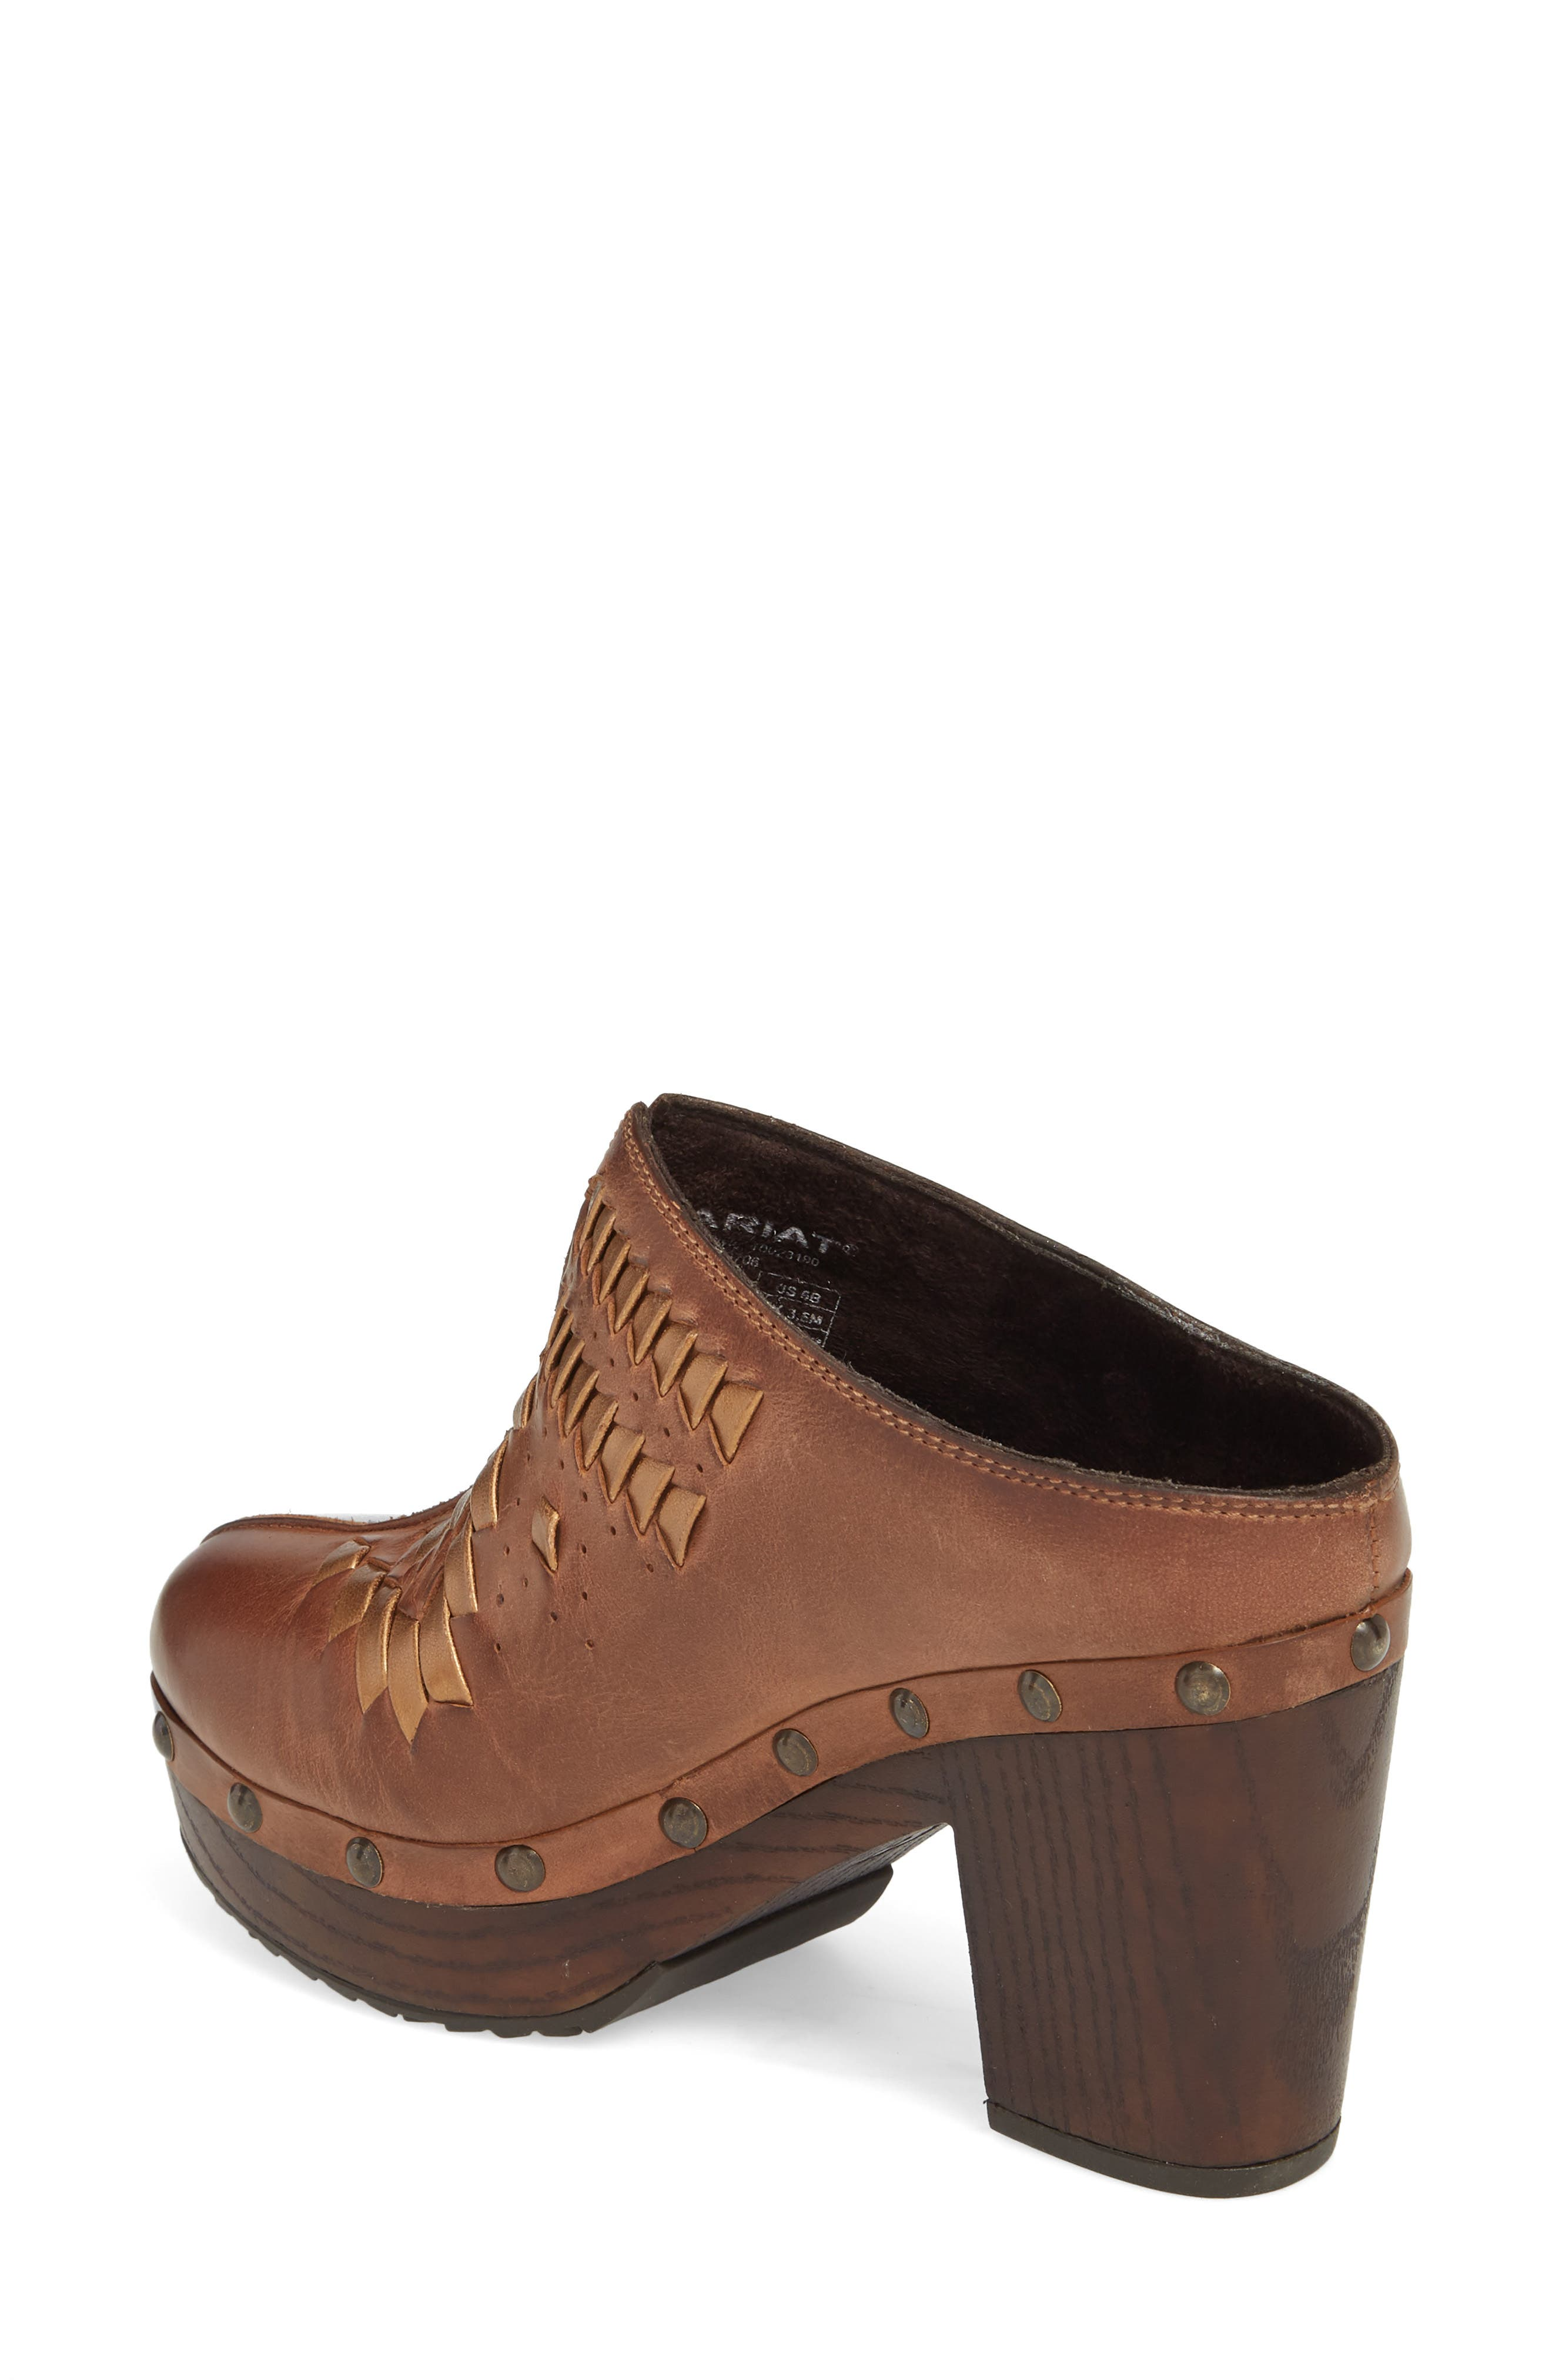 Bria Platform Clog,                             Alternate thumbnail 2, color,                             Bronzed Brown Leather